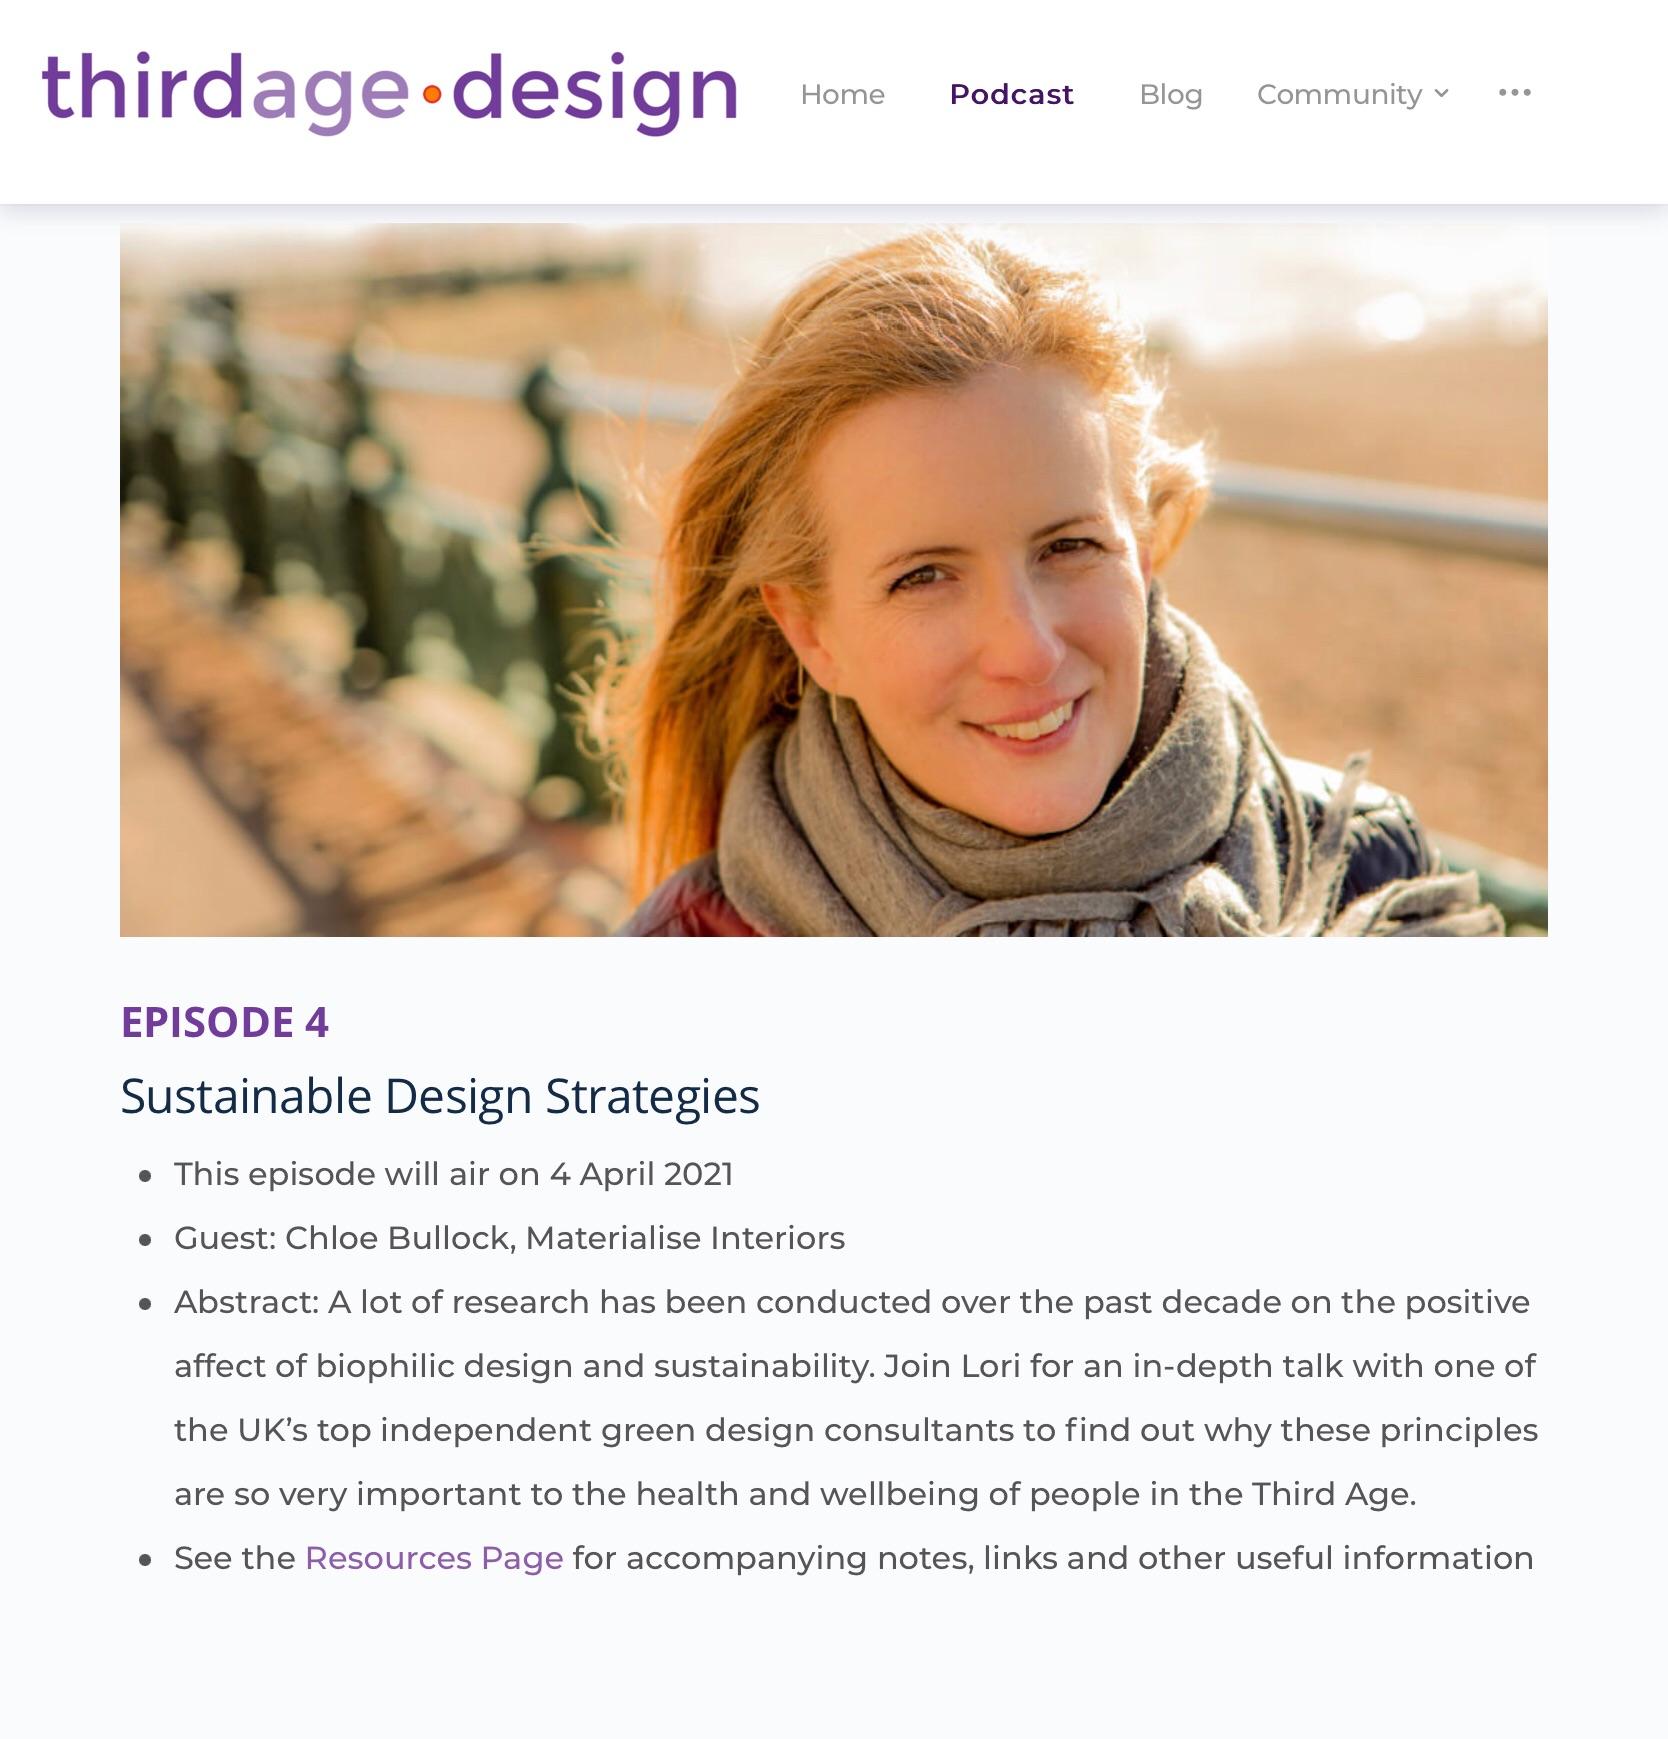 Third age design Lori Pinkerton roles podcast interview